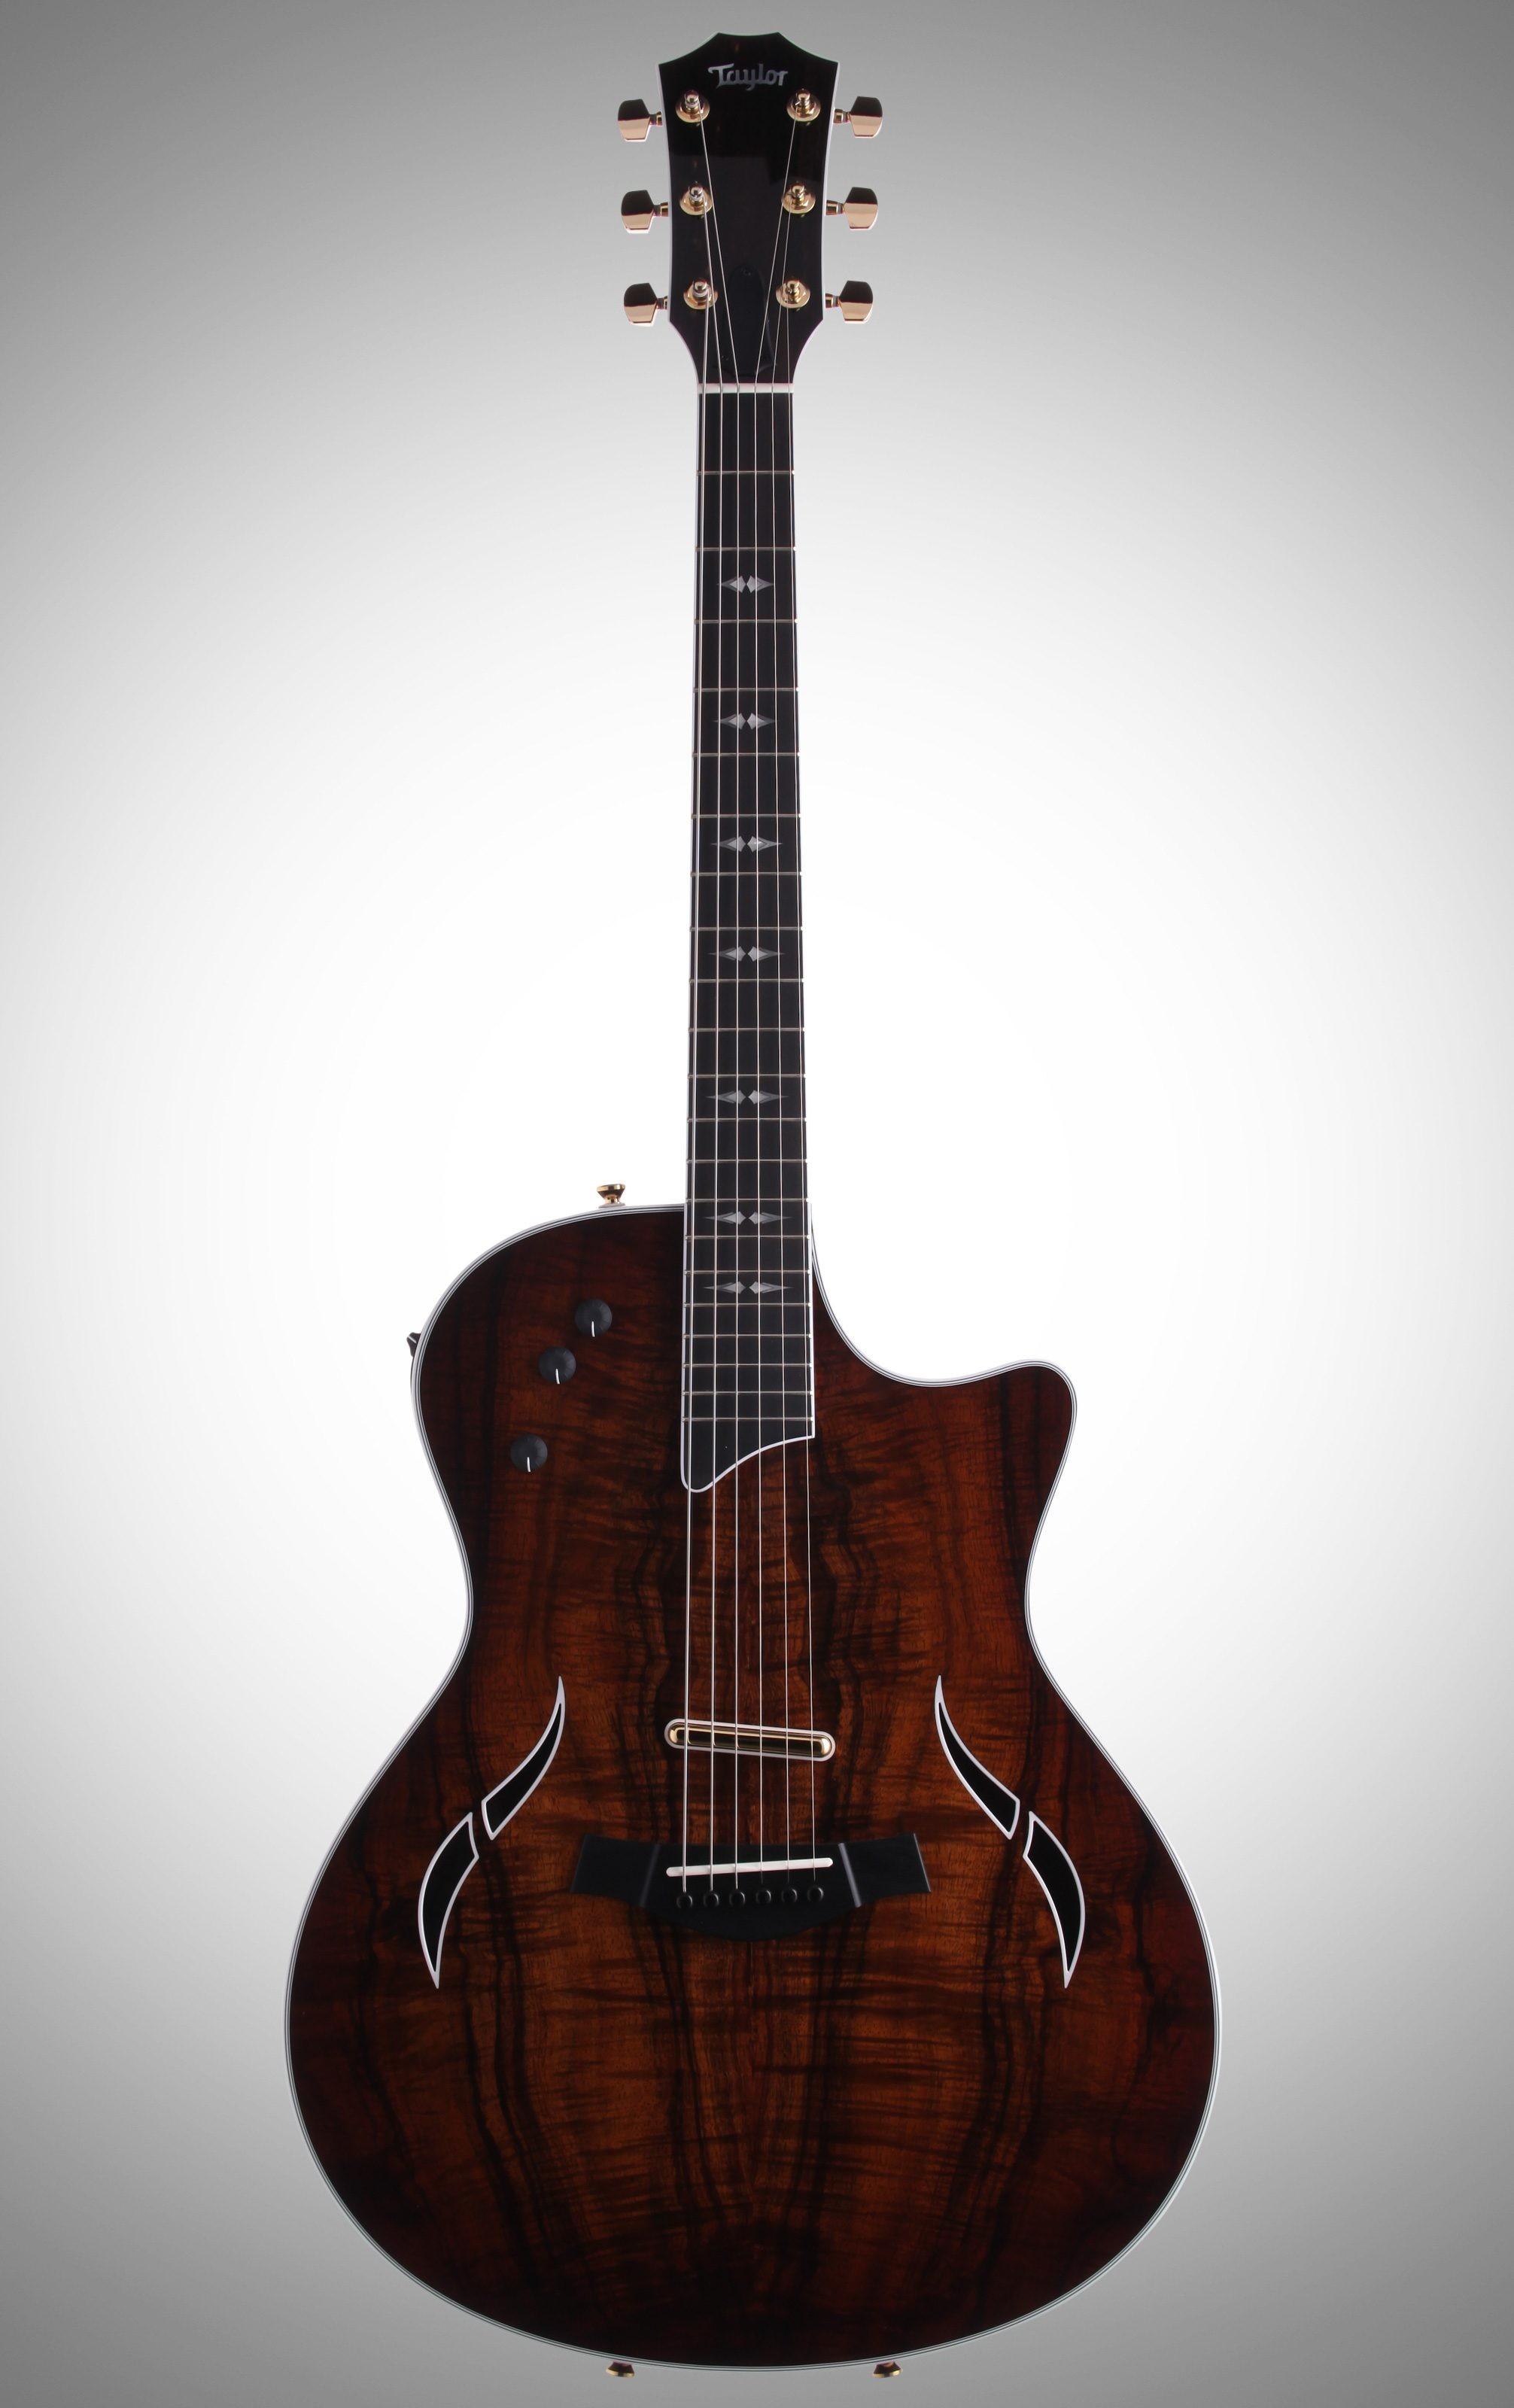 Taylor T5 C2 Thinline Fiveway Custom Koa Cutaway Acoustic Electric Guitar with Case